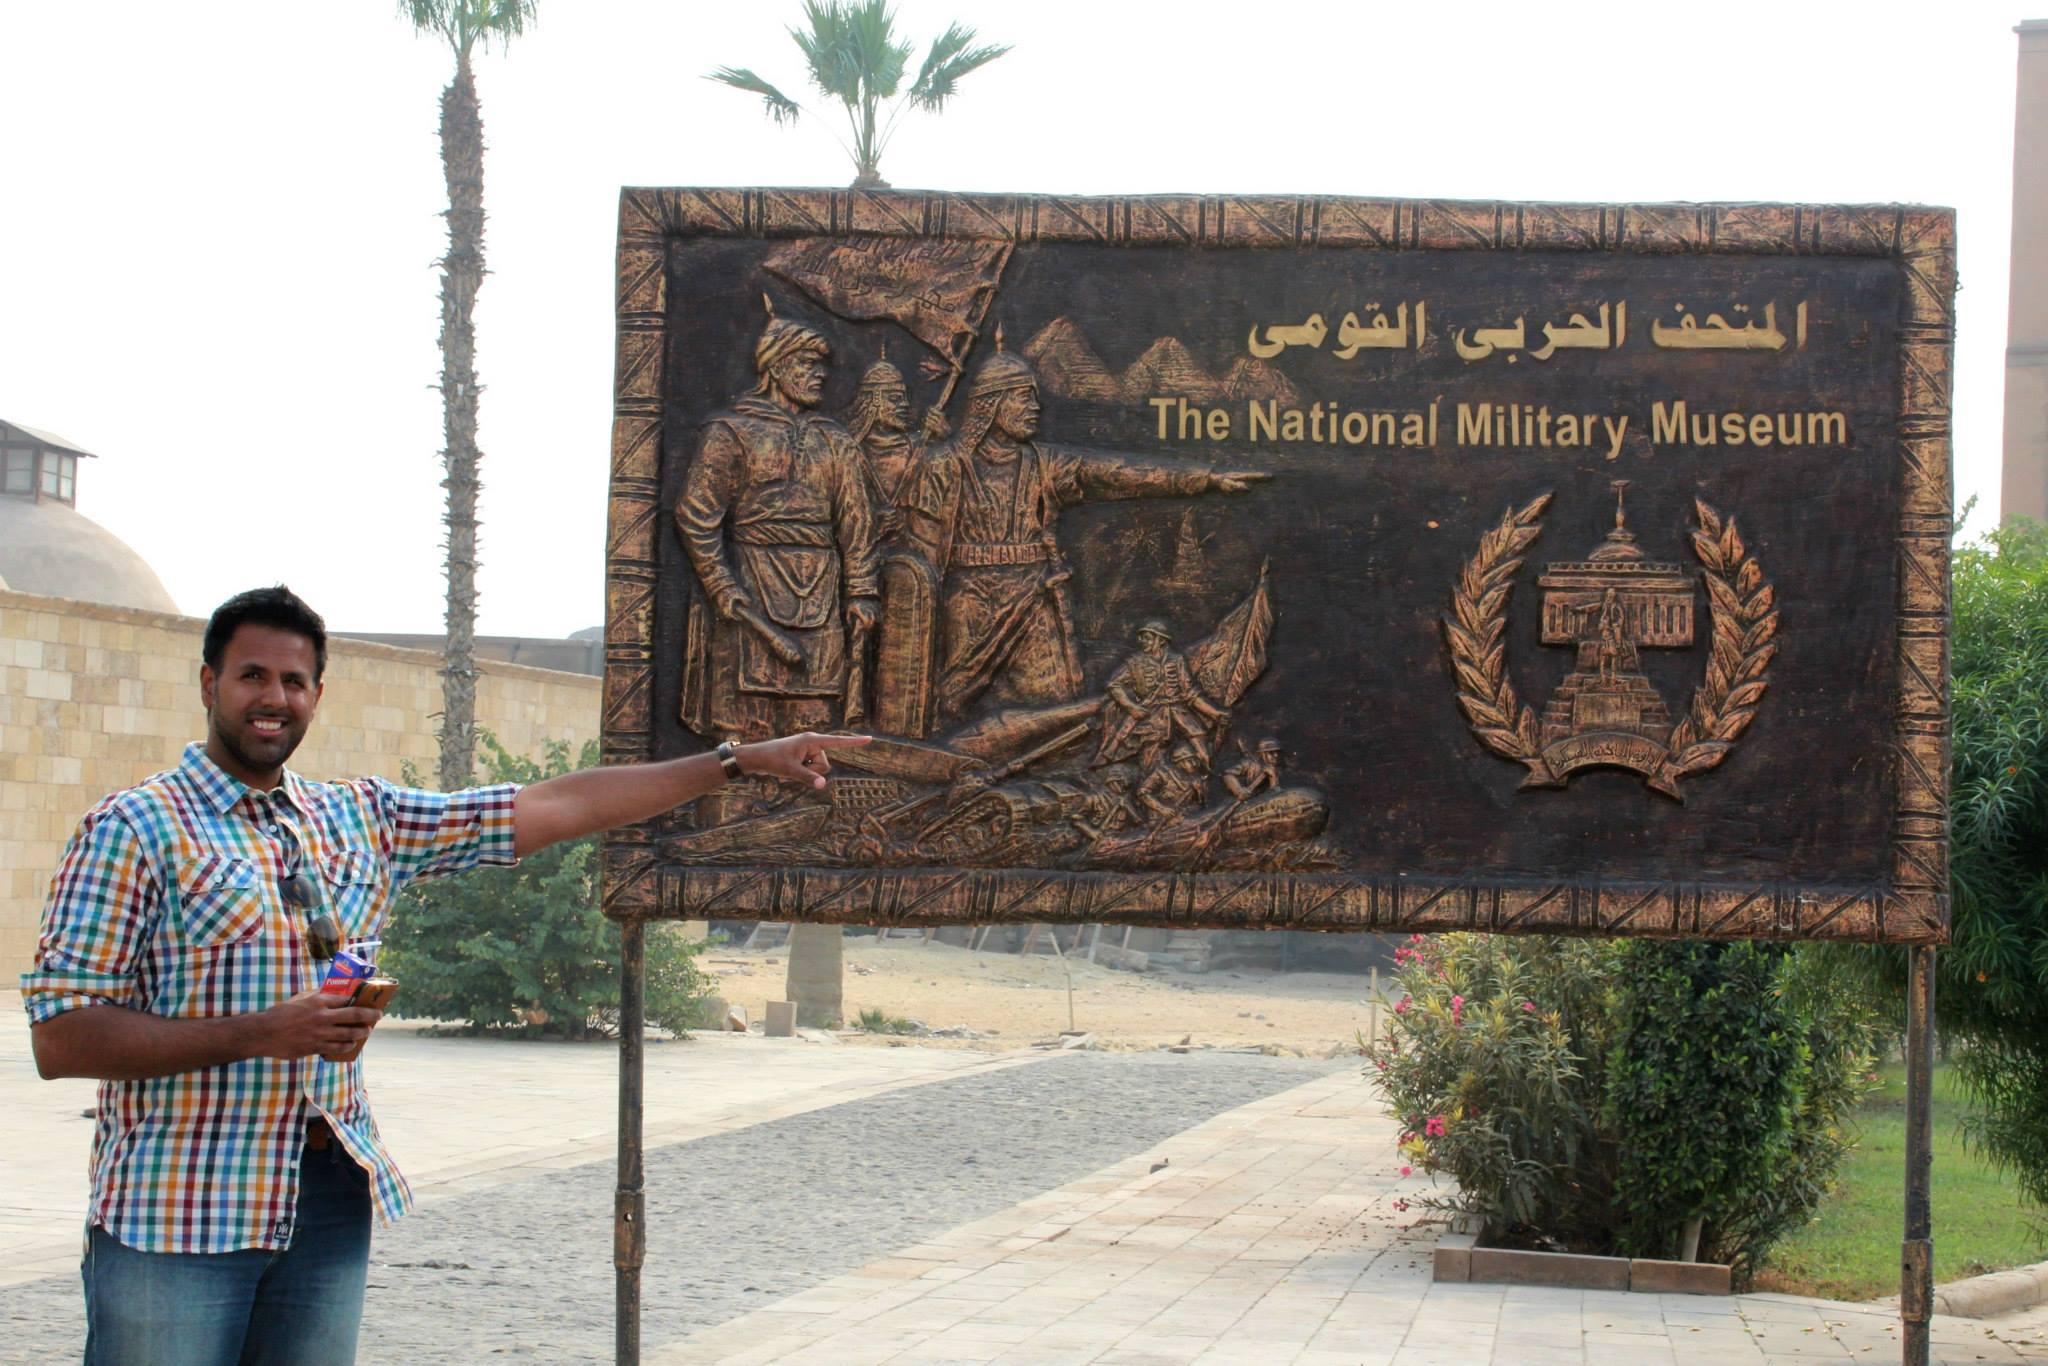 egypt national military museum egypt